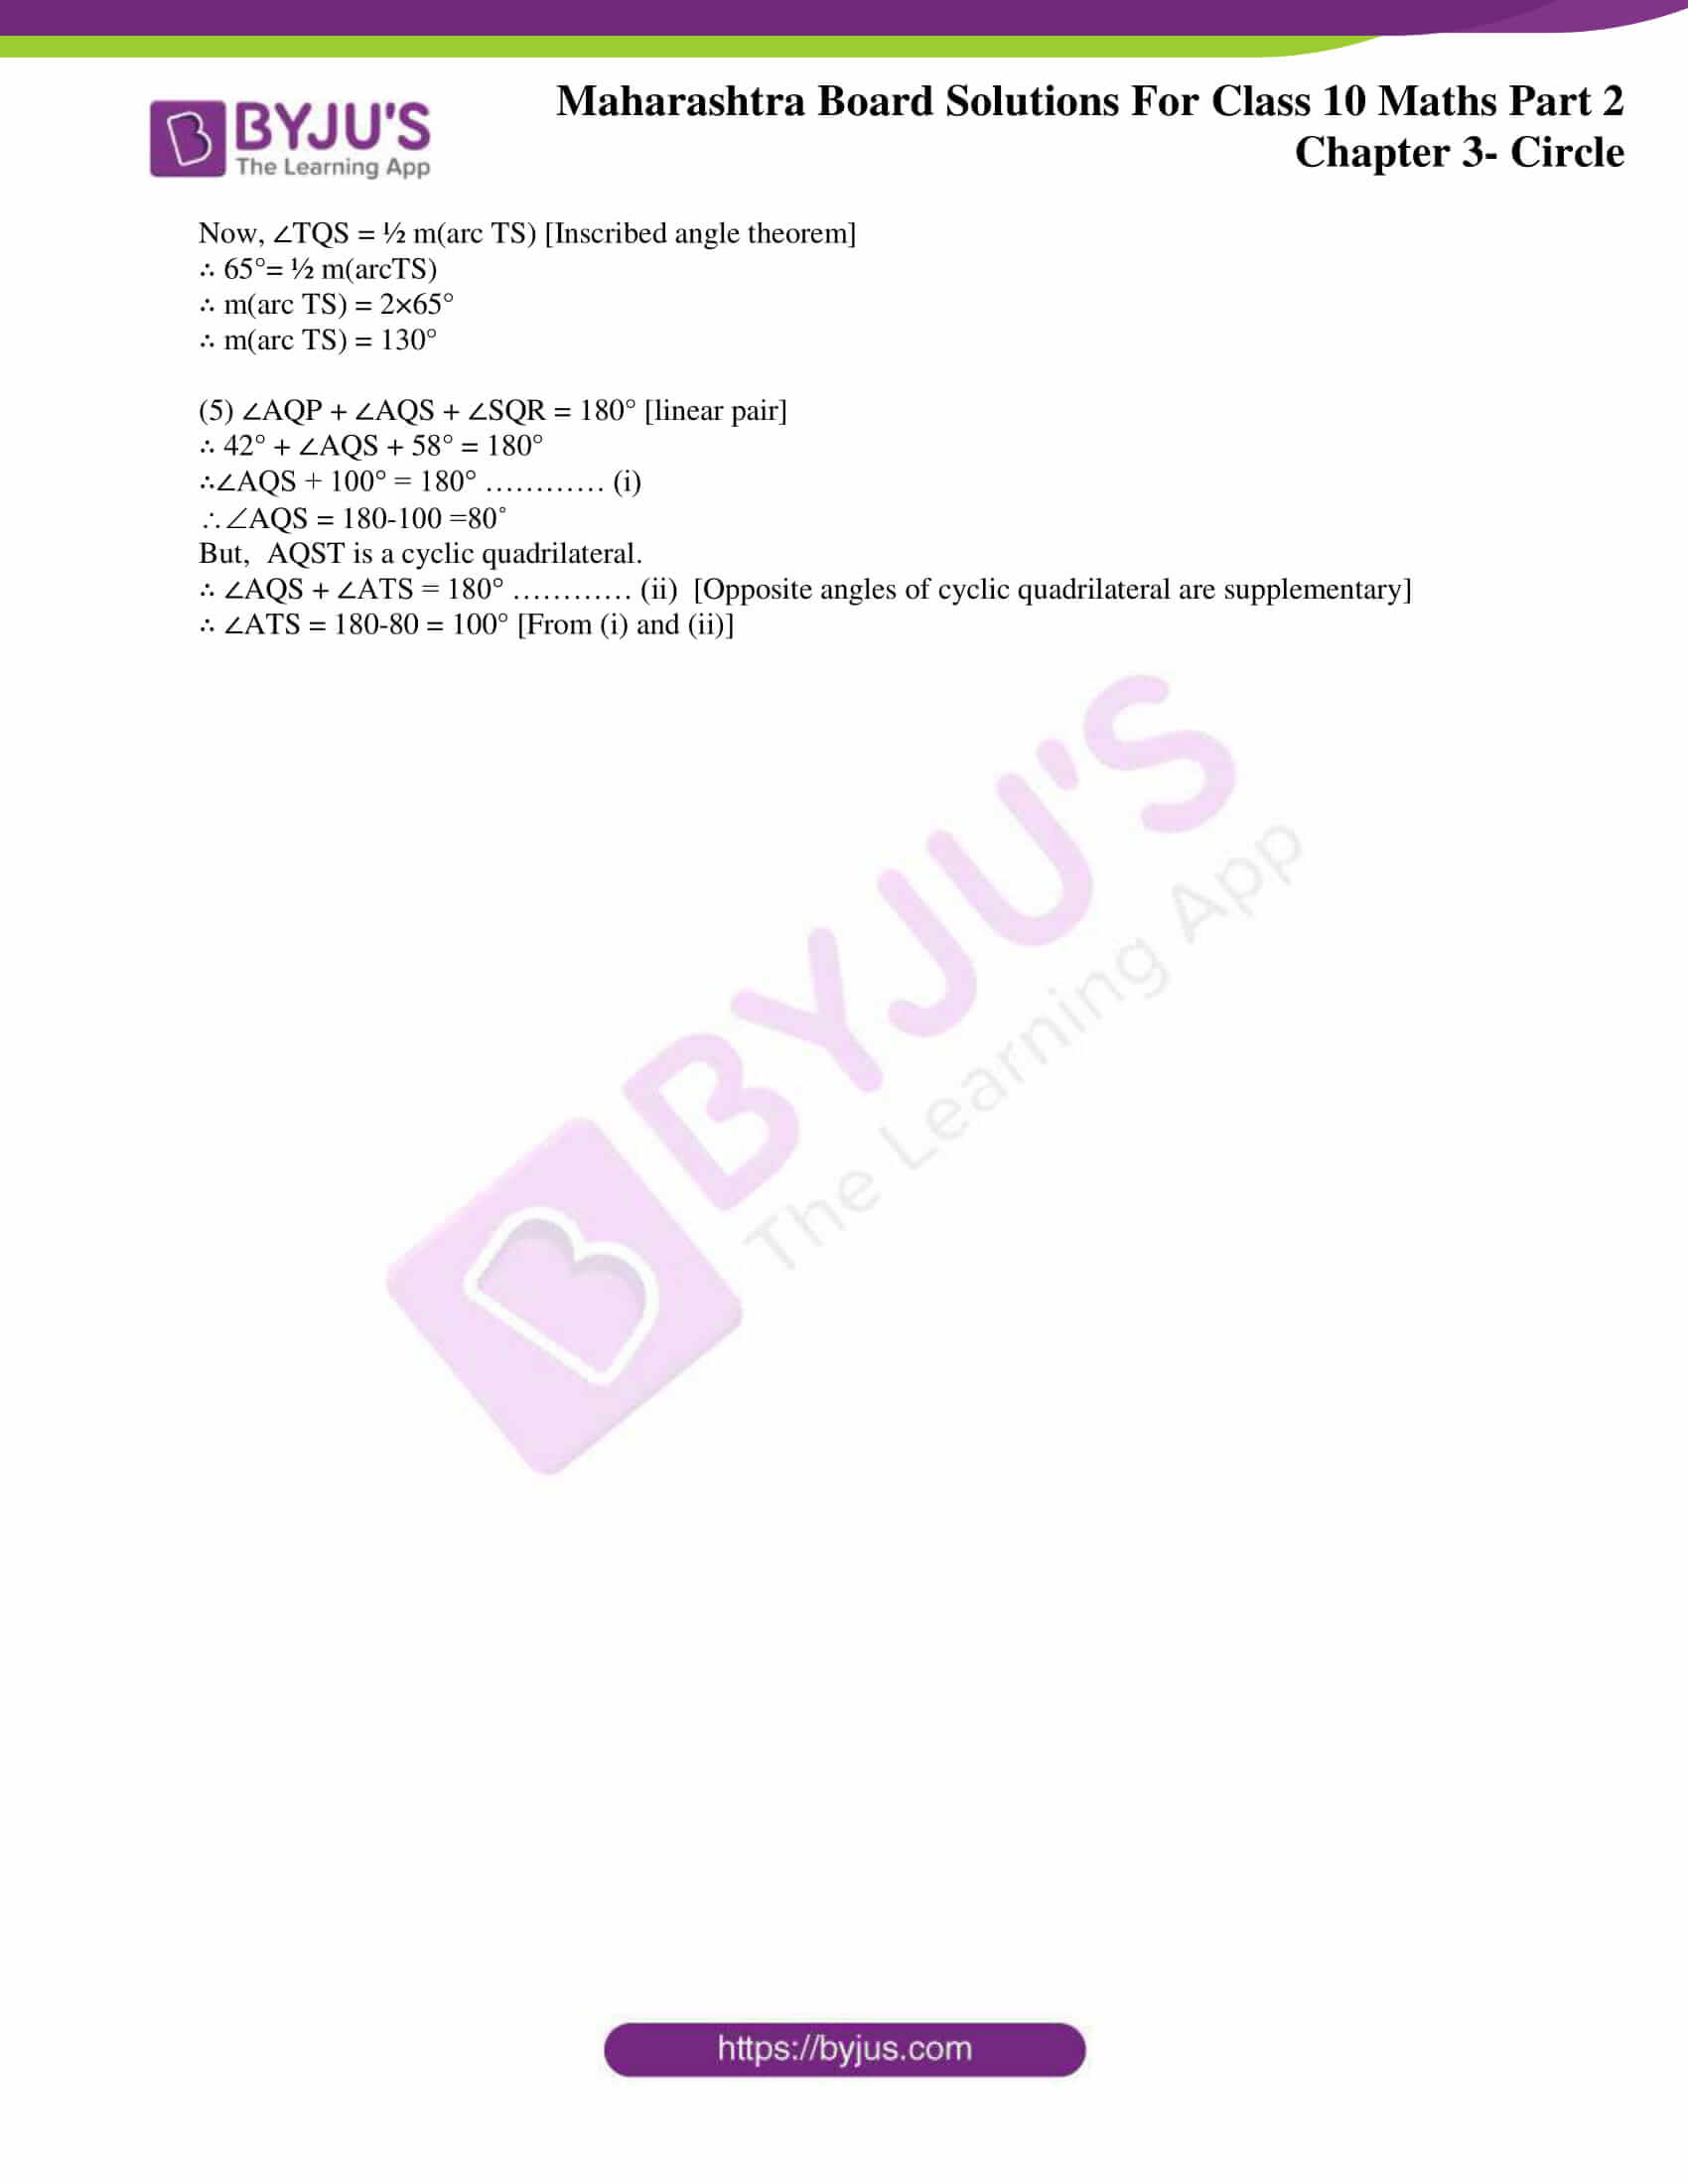 msbshse sol class 10 maths part 2 chapter 3 34